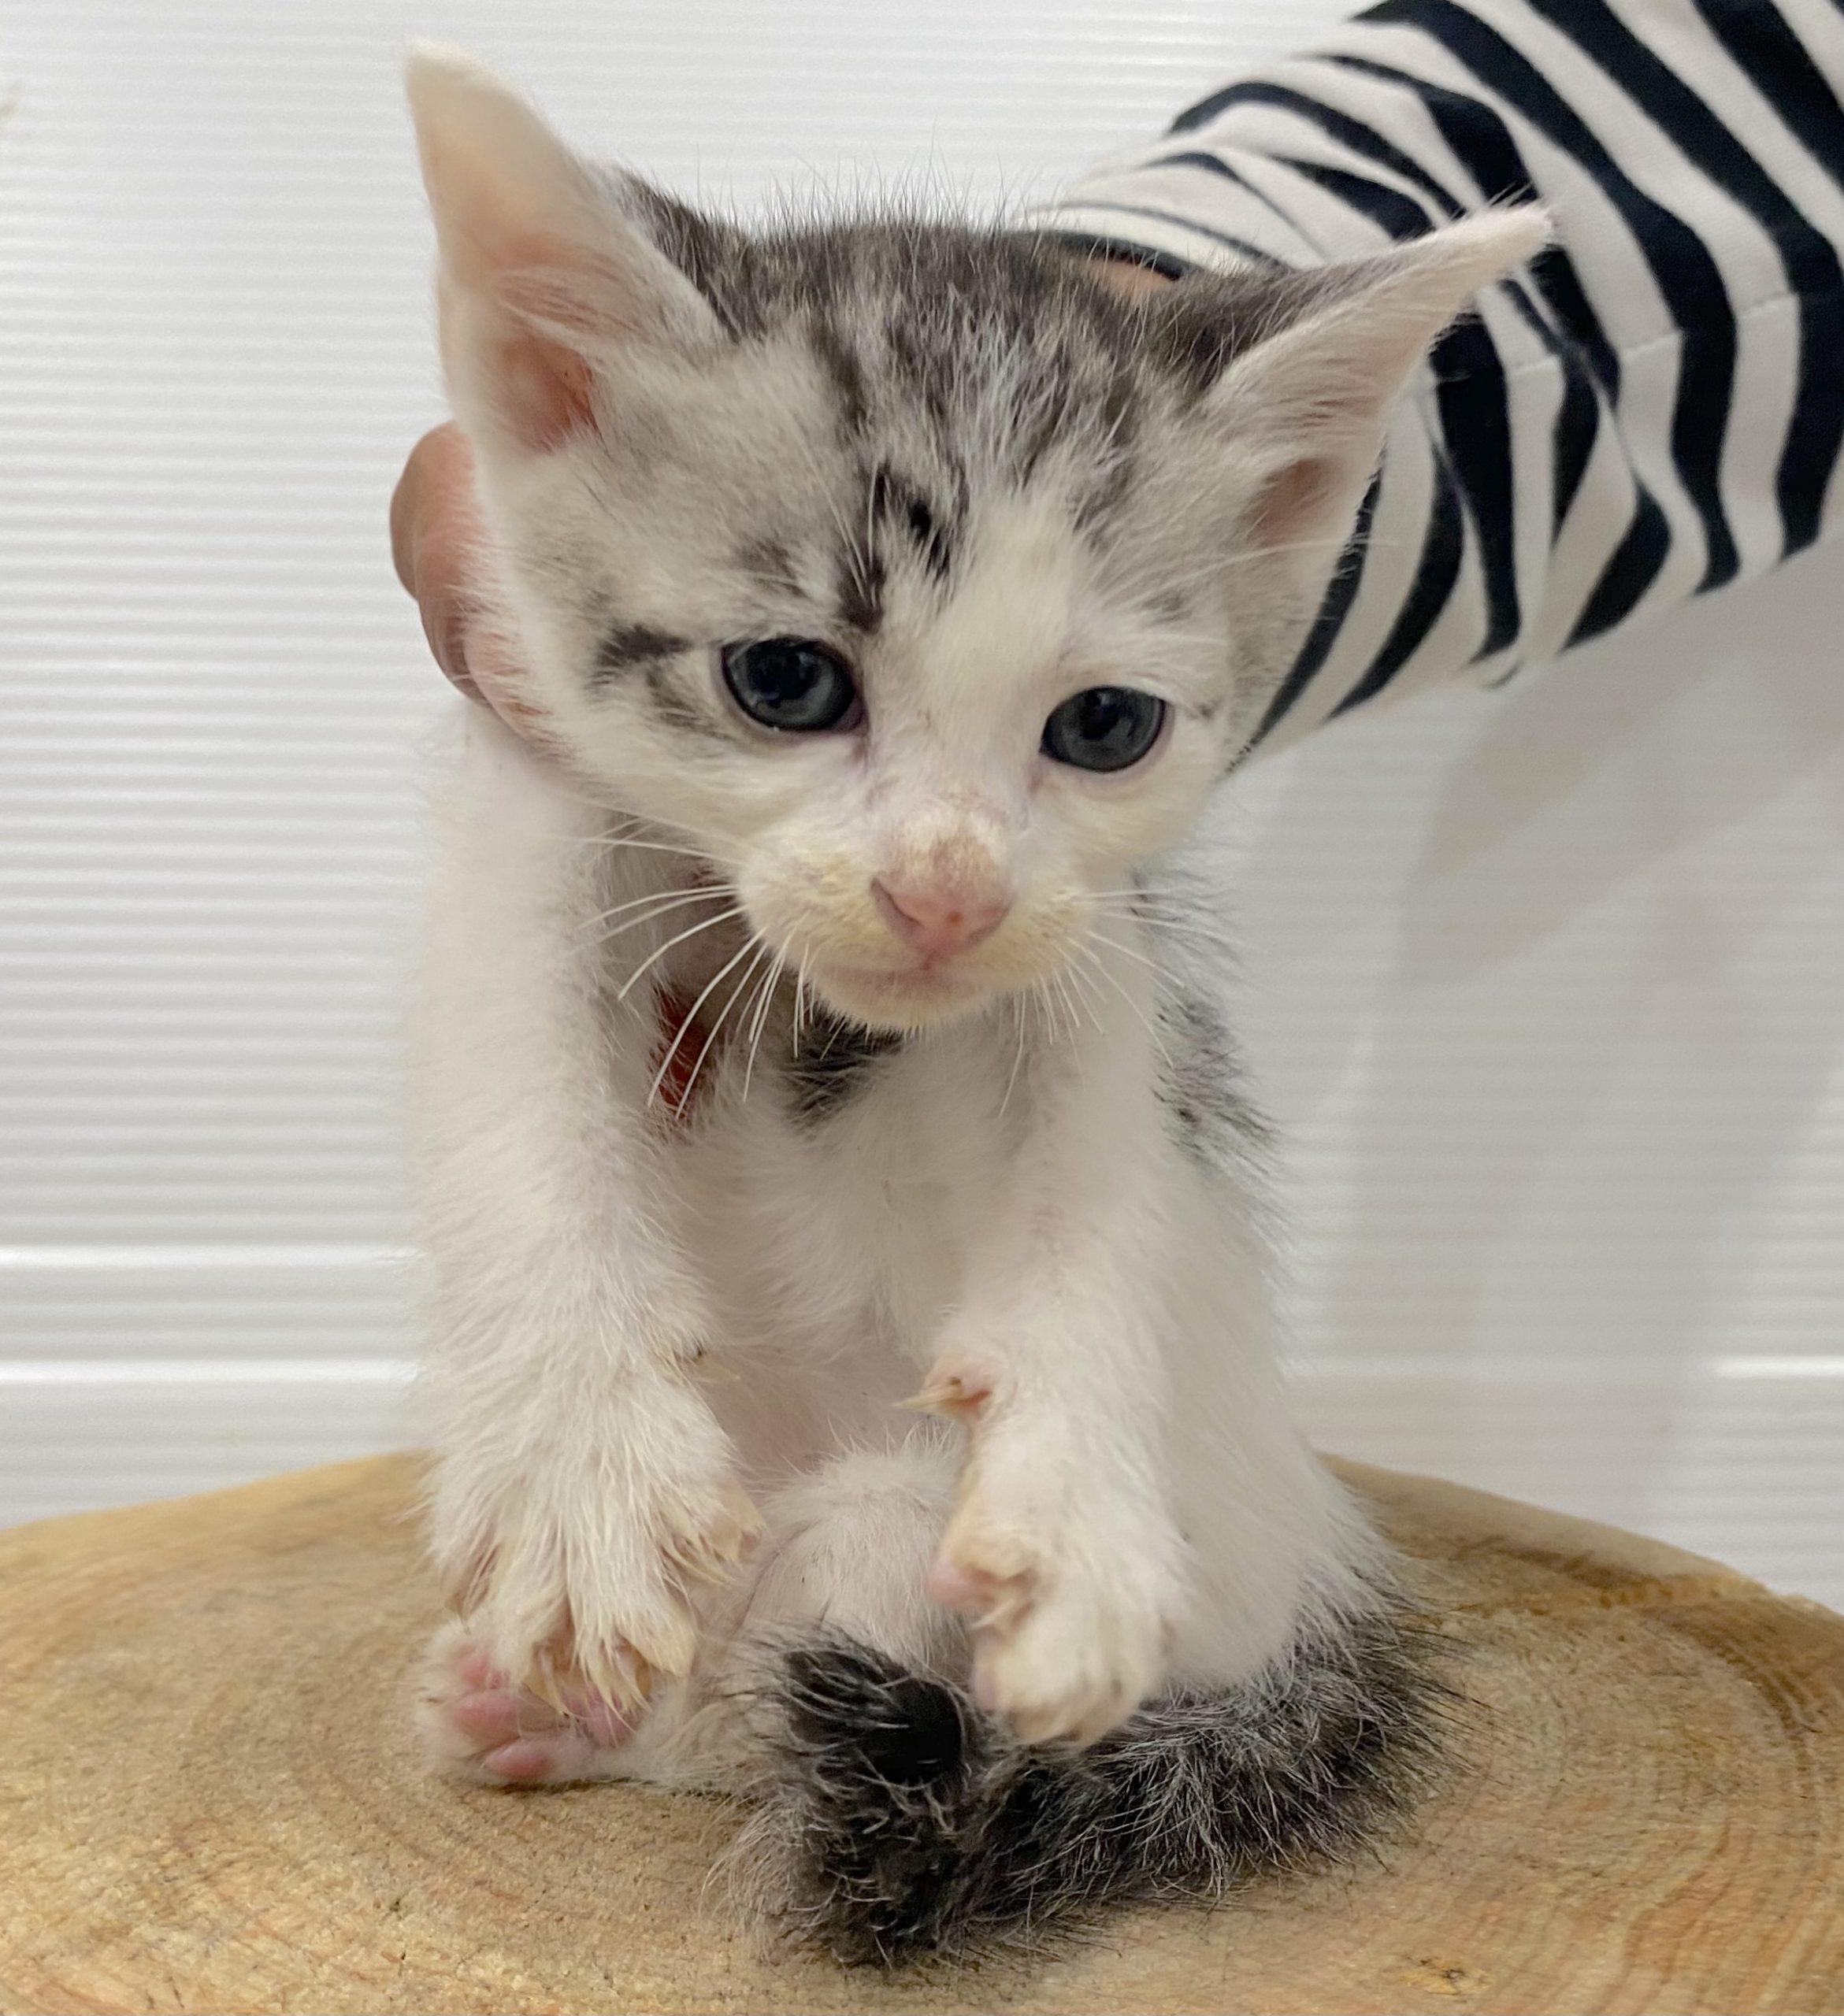 <ul> <li>猫種:日本猫</li> <li>性別:男の子</li> <li>名前:</li> <li>年齢:2021年6月9日生まれ</li> <li>保護経緯:飼い主が高齢になり認知症のため飼育困難</li> </ul>